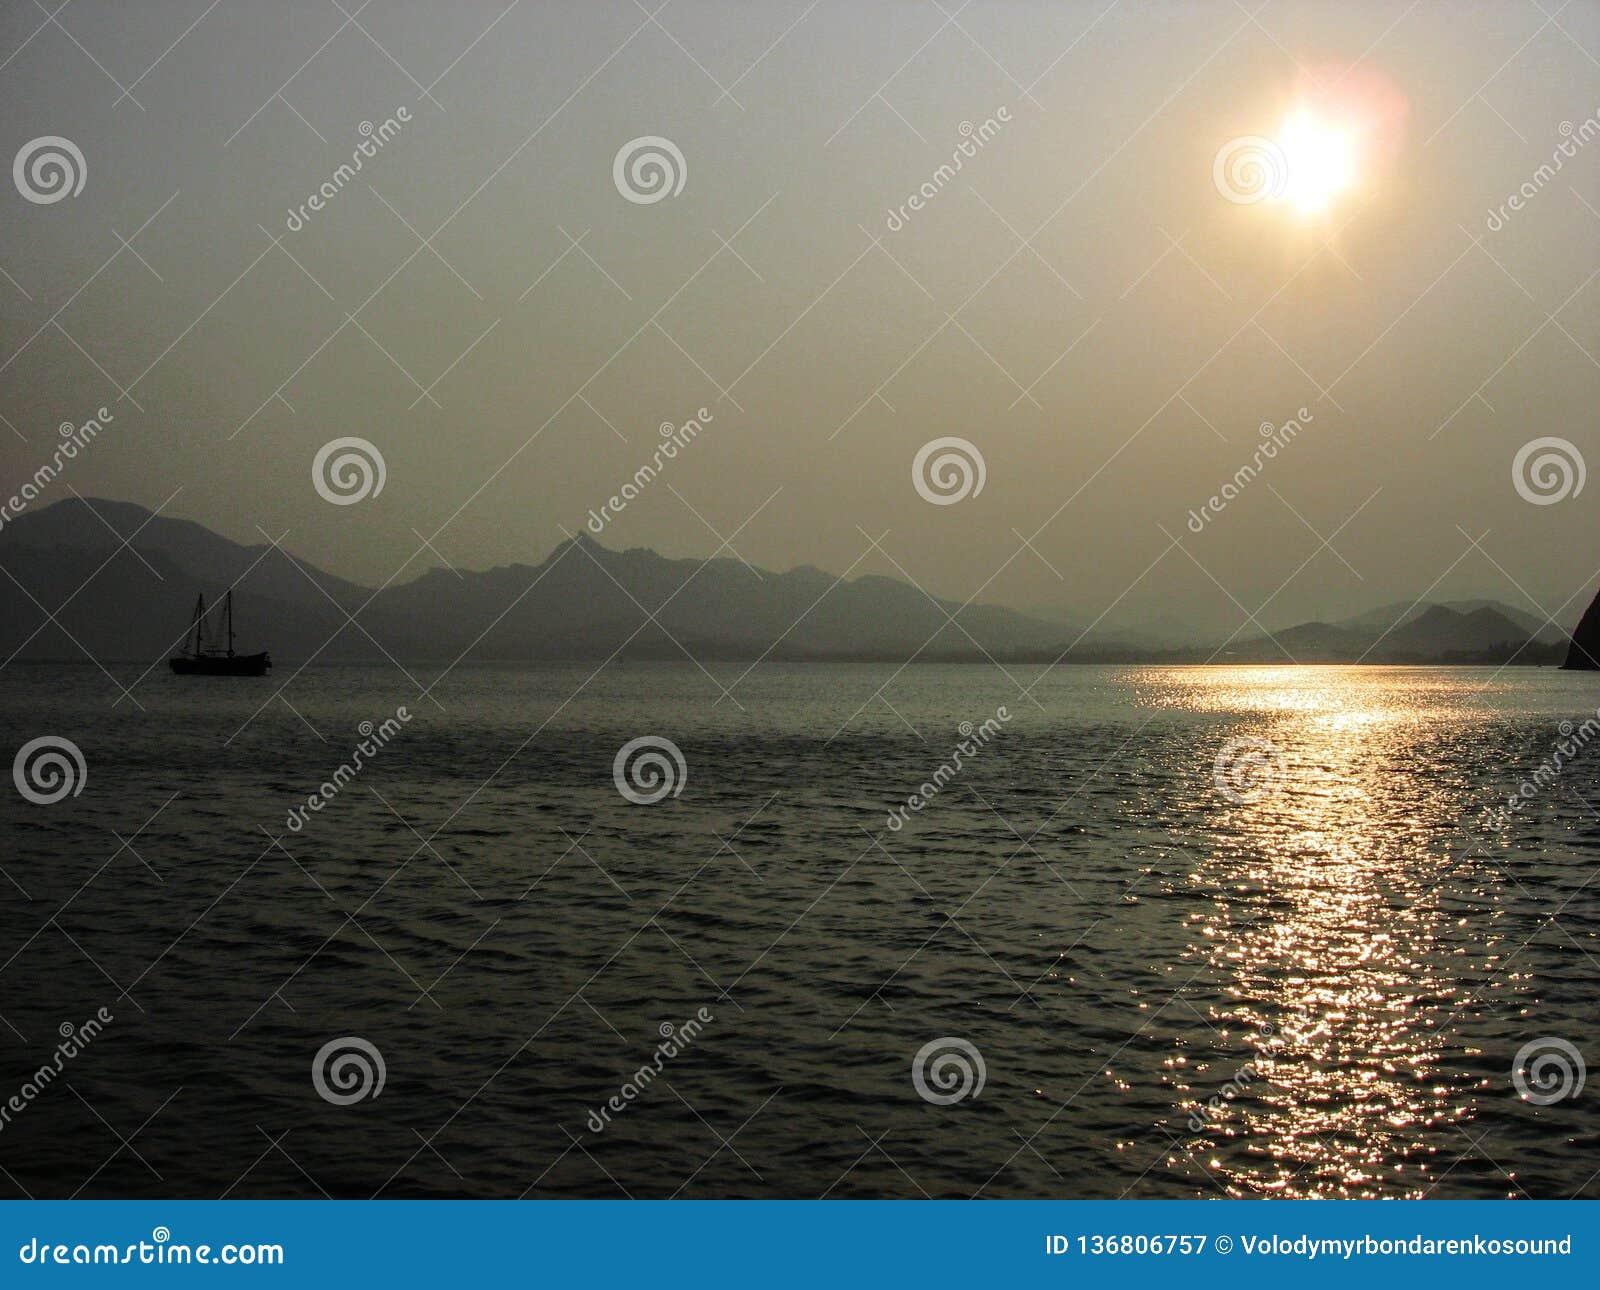 Beautiful sunset, small ship sailing in the ocean. Odessa, Ukraine